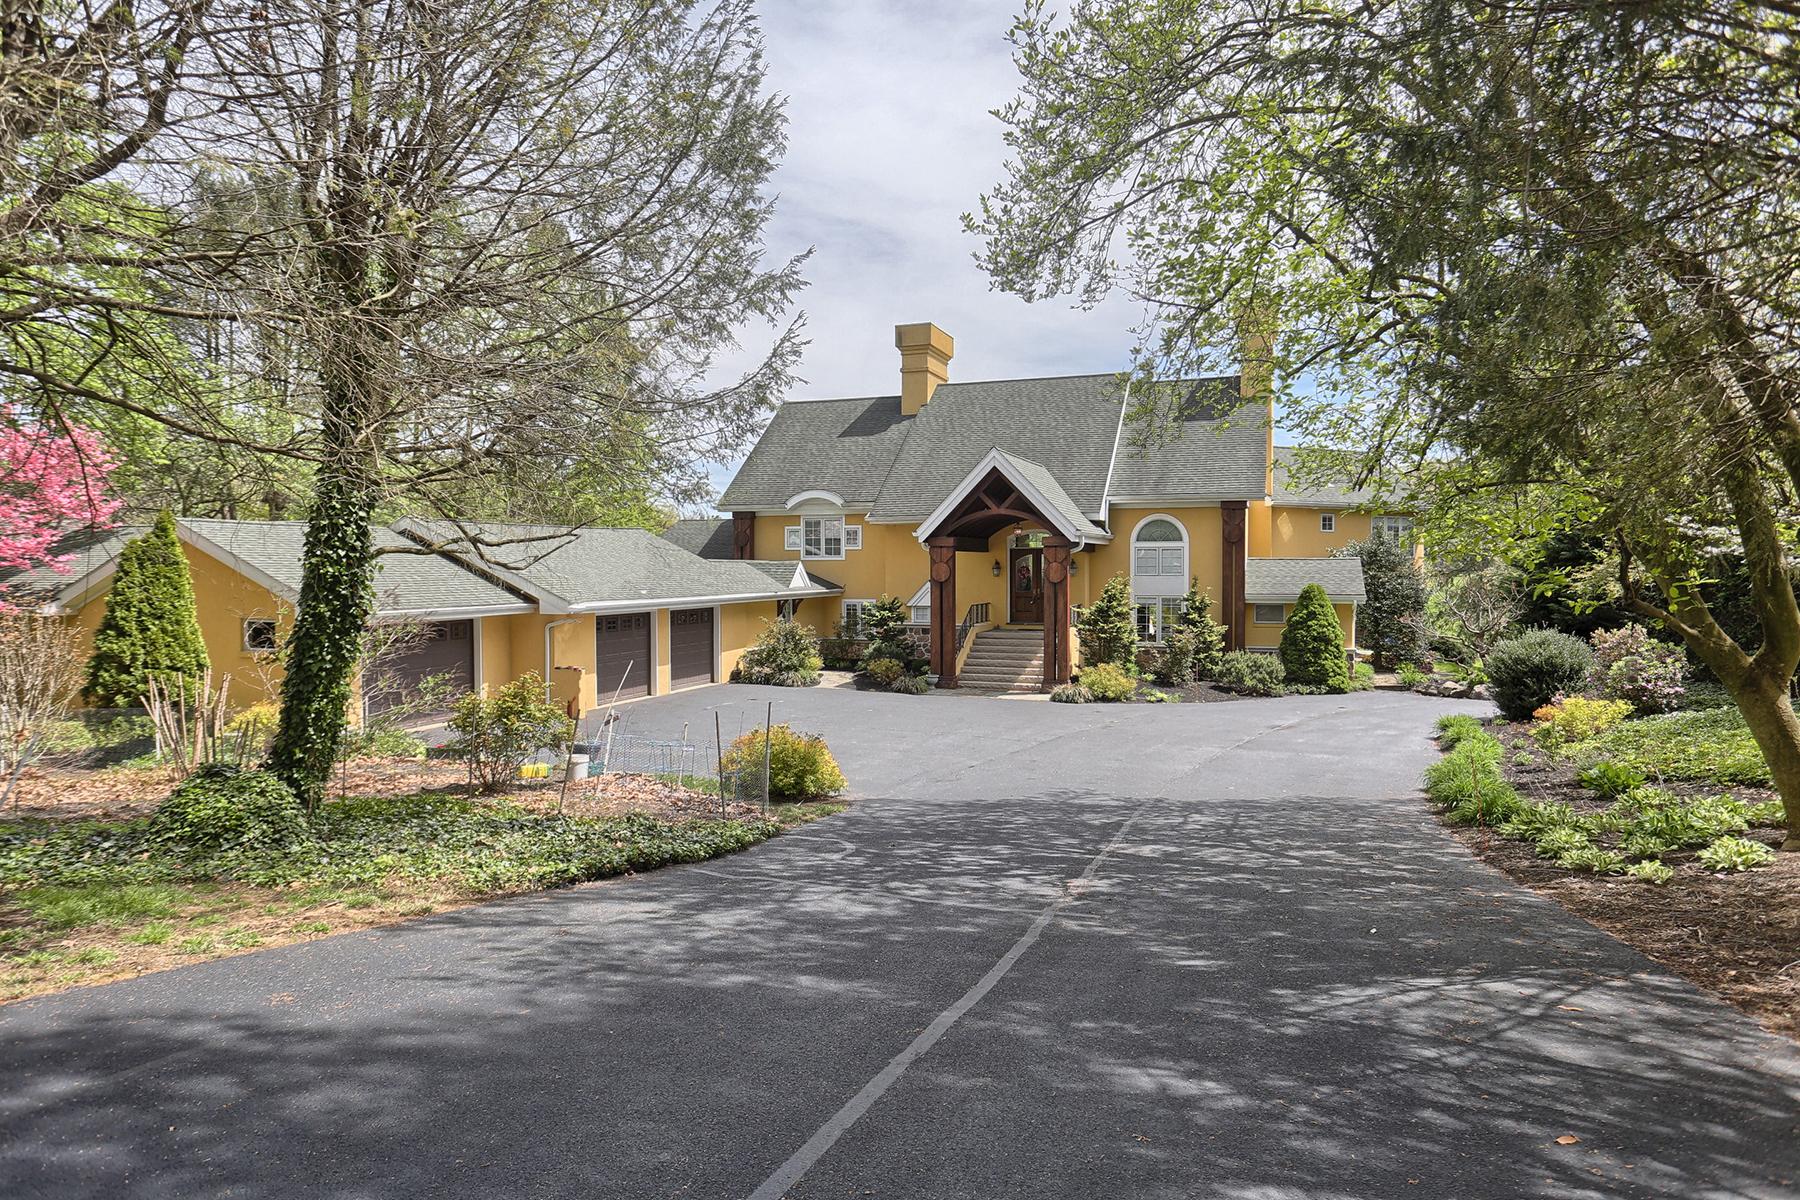 Single Family Home for Sale at 663 Oakwood Lane 663 Oakwood Lane Lancaster, Pennsylvania 17603 United States